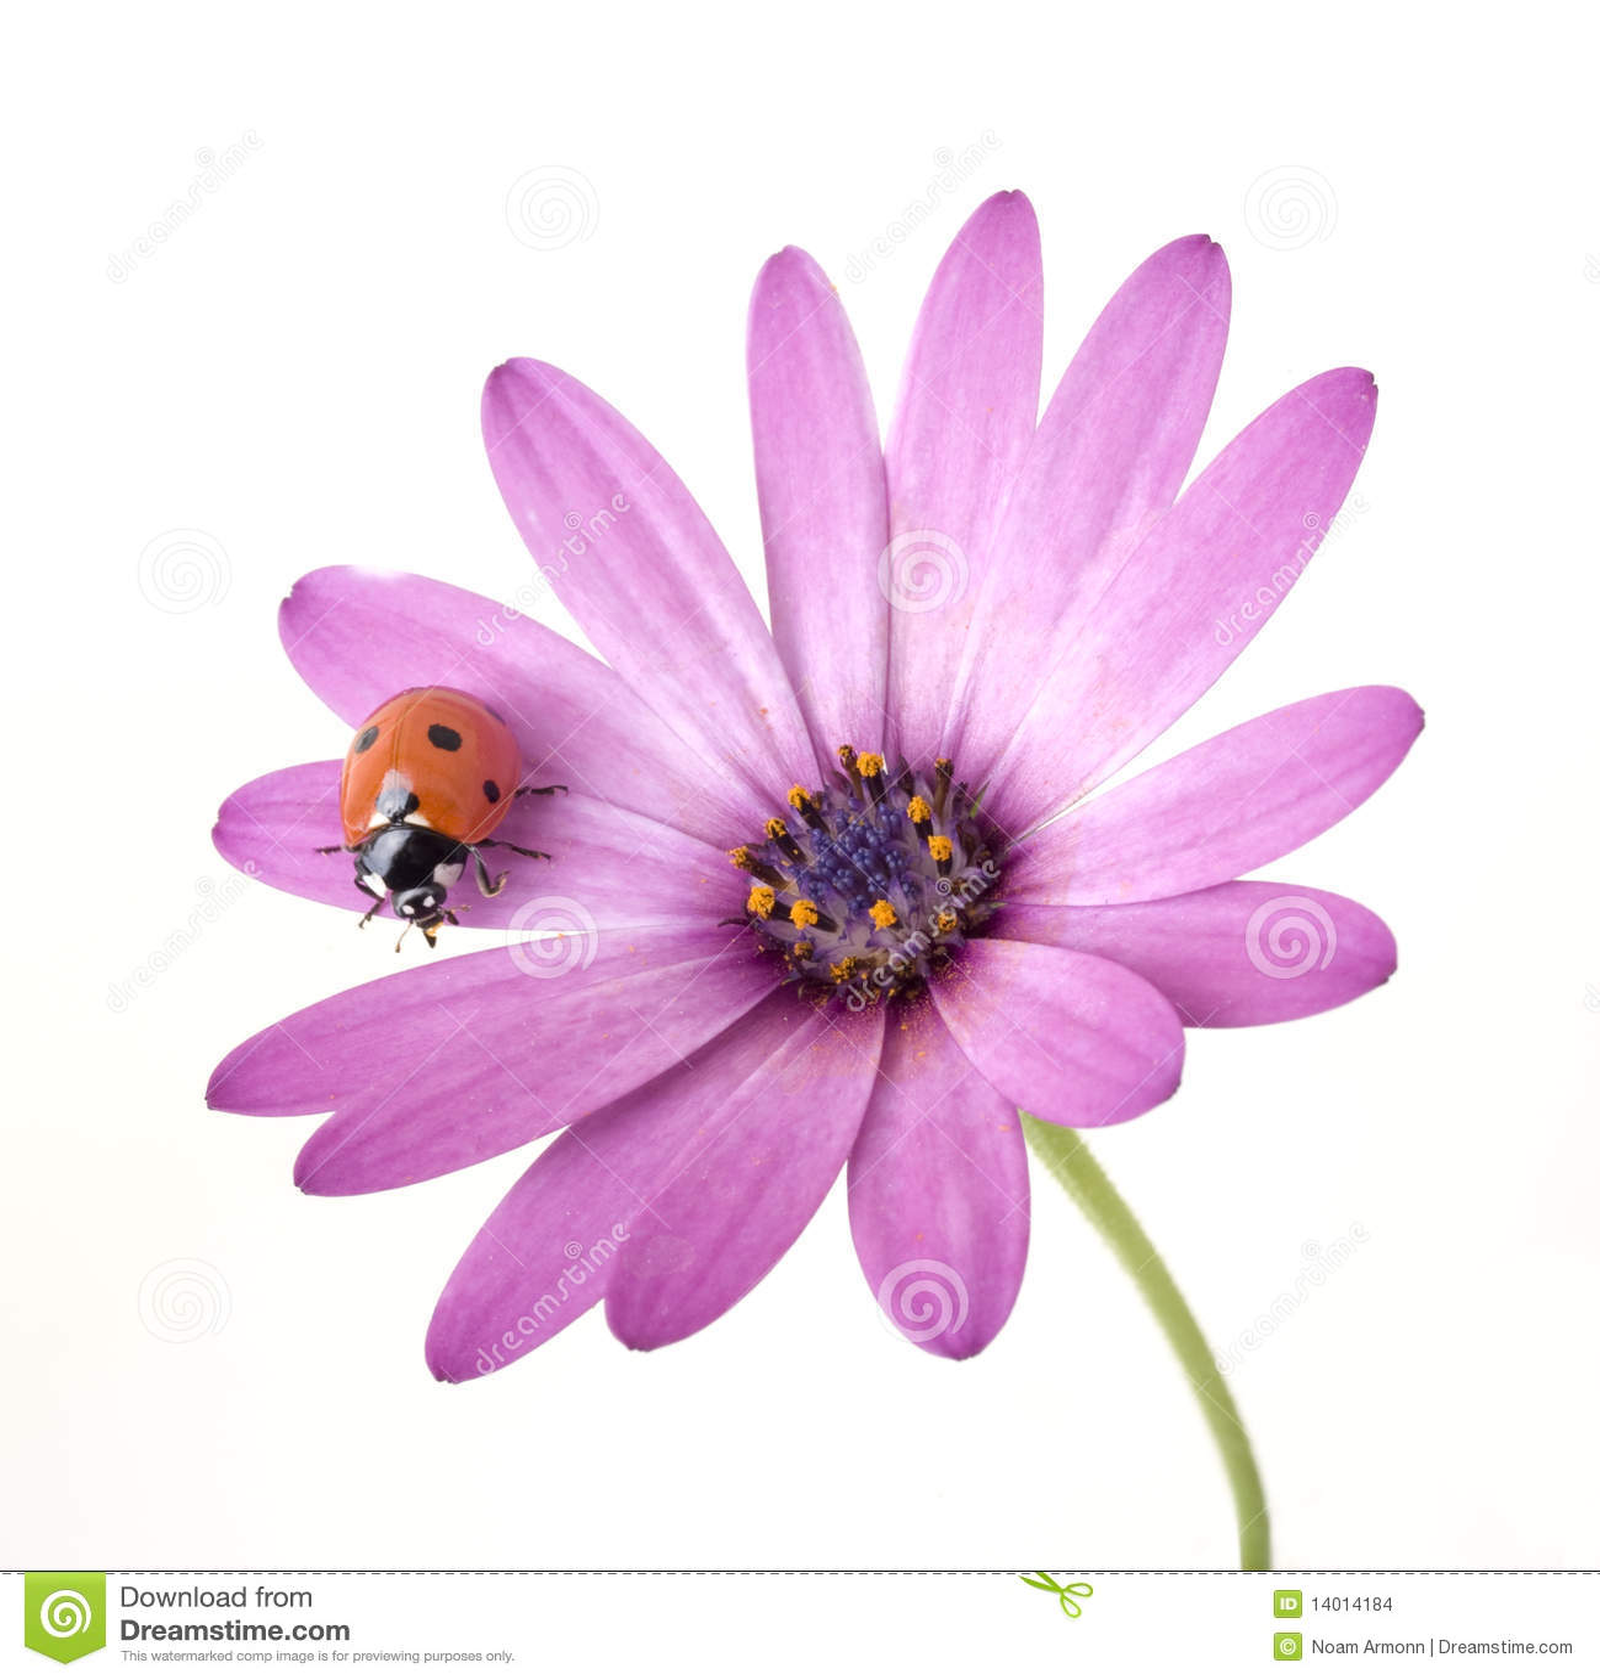 ... On Pink Flowers ladybug on pink flower stock images - image: 14014184